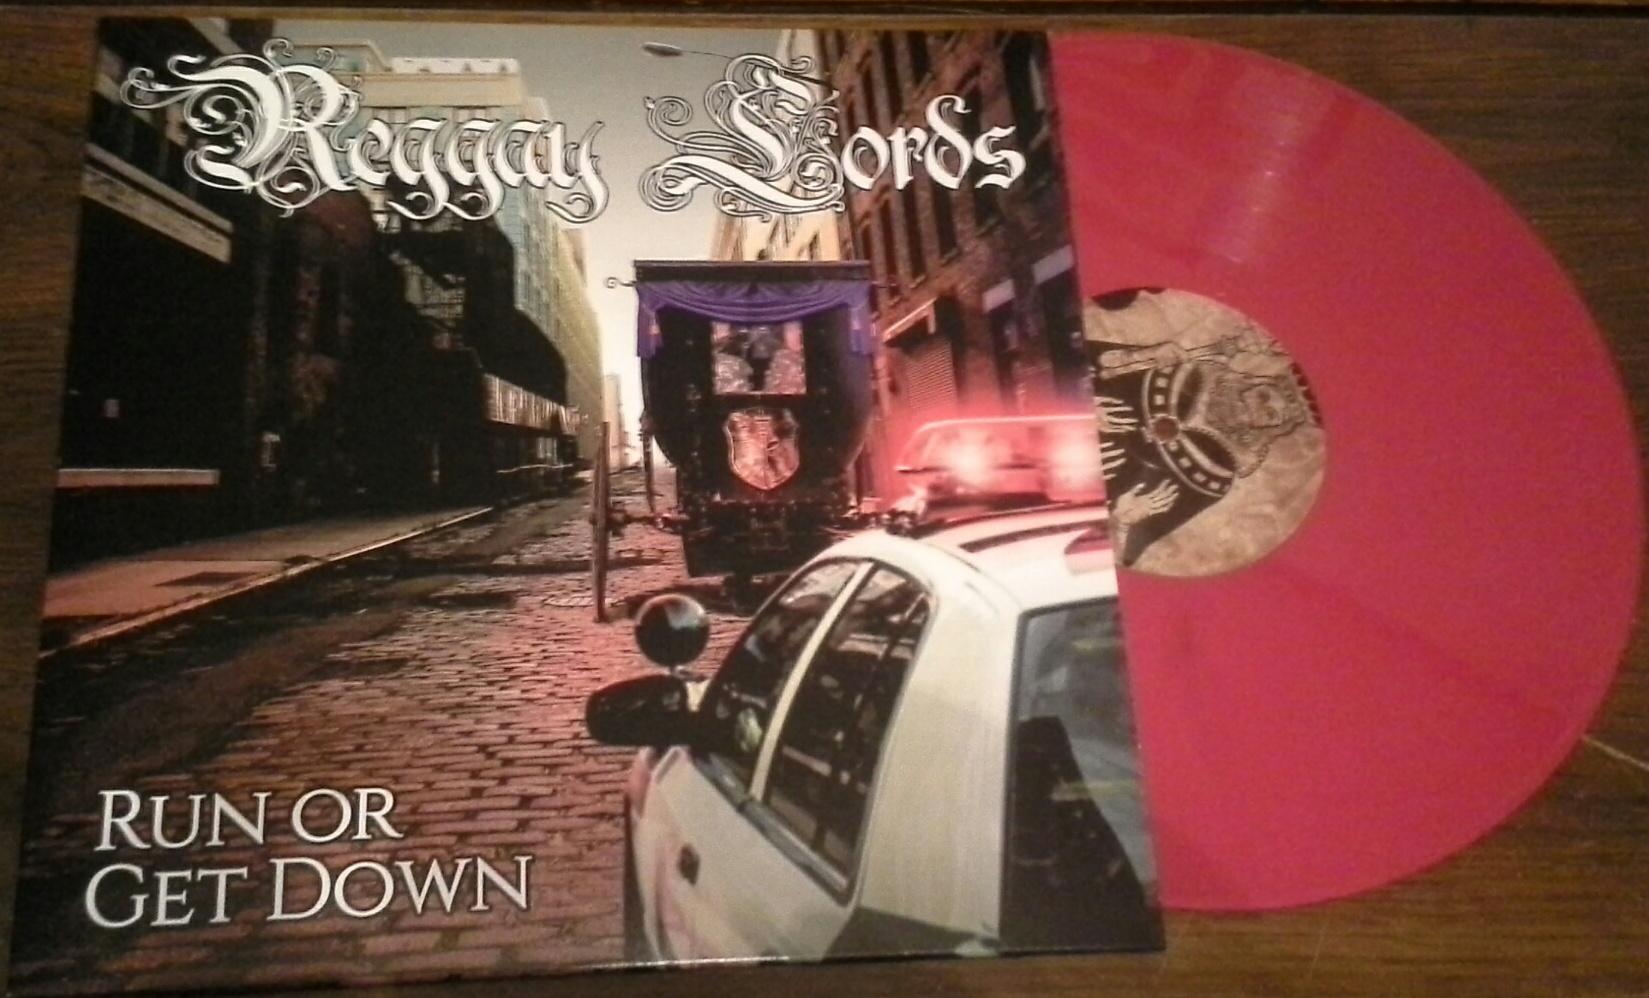 Reggay Lords/RUN OR GET DOWN (PURPLE) LP